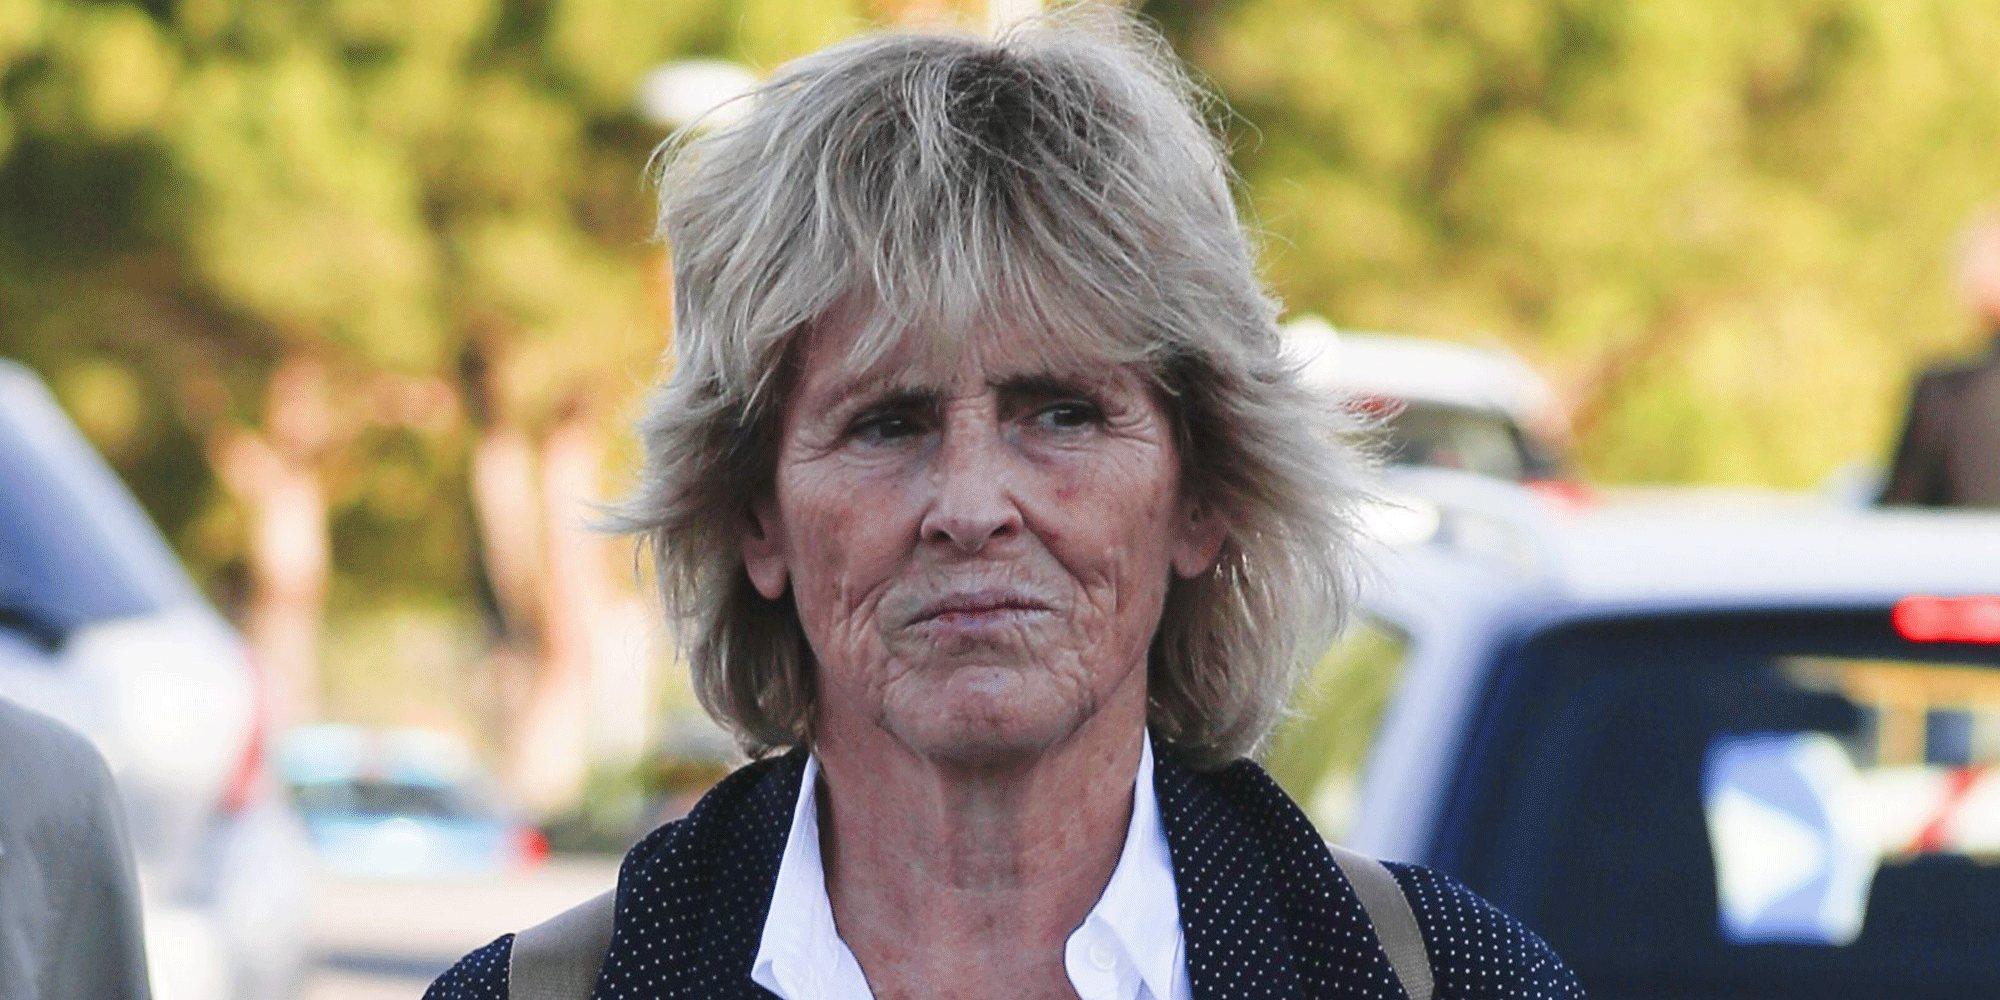 La odisea de Mercedes Milá volviendo en furgoneta tras quedarse atrapada en Italia por el coronavirus